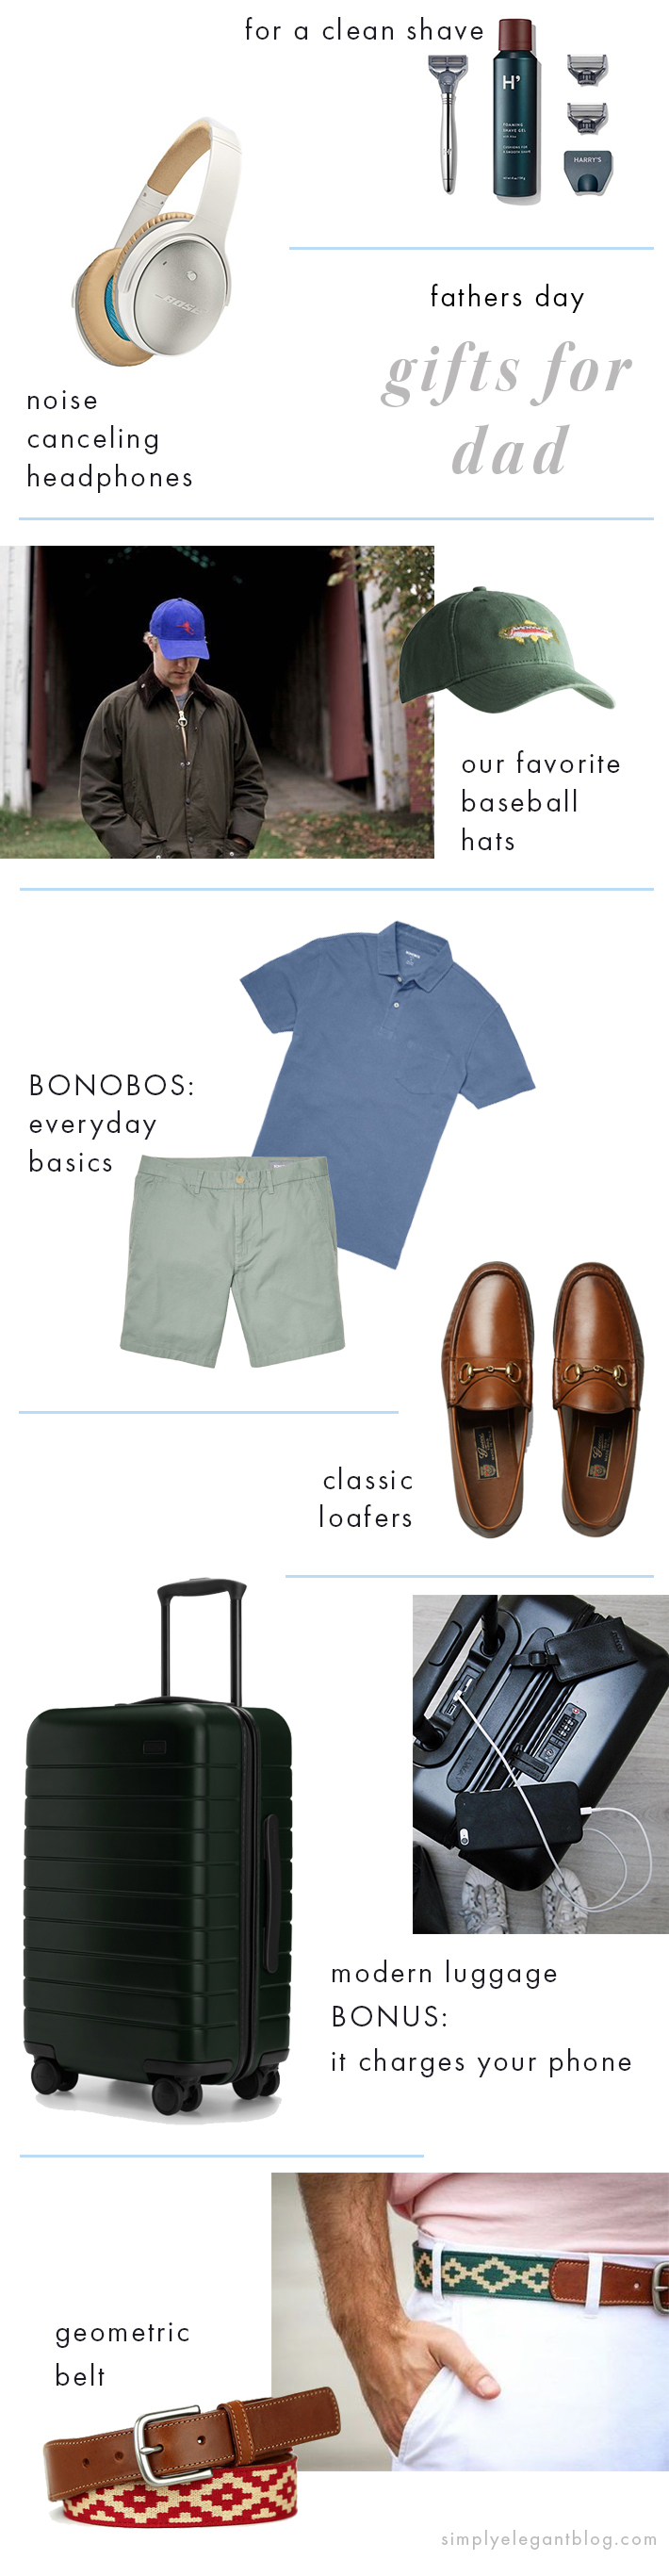 fathers day gift ideas - away suitcase, harding lane hat, la matera belt